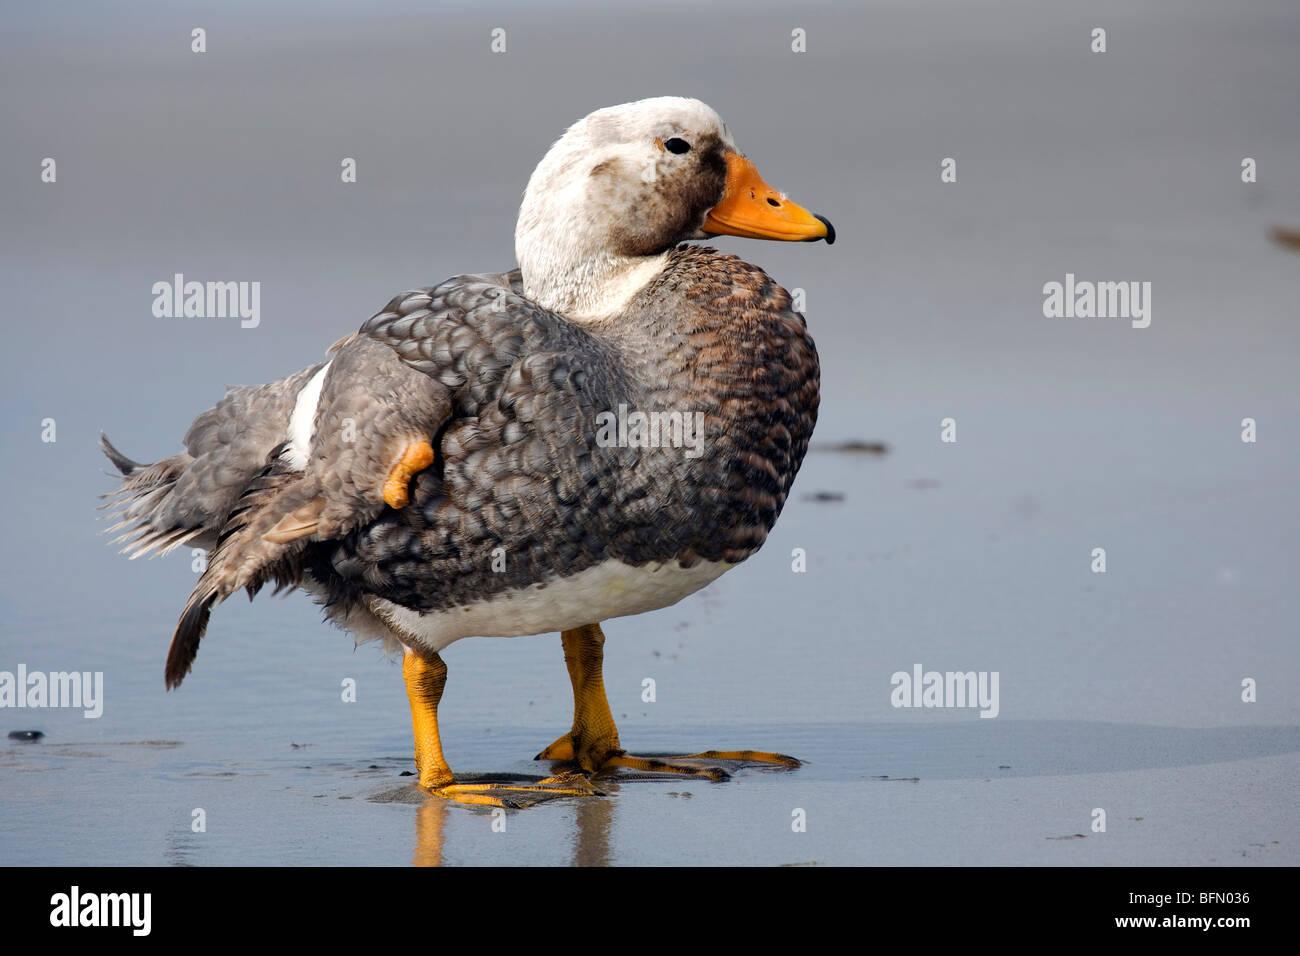 Falkland Islands; Sea Lion Island. Male flightless steamer duck. - Stock Image